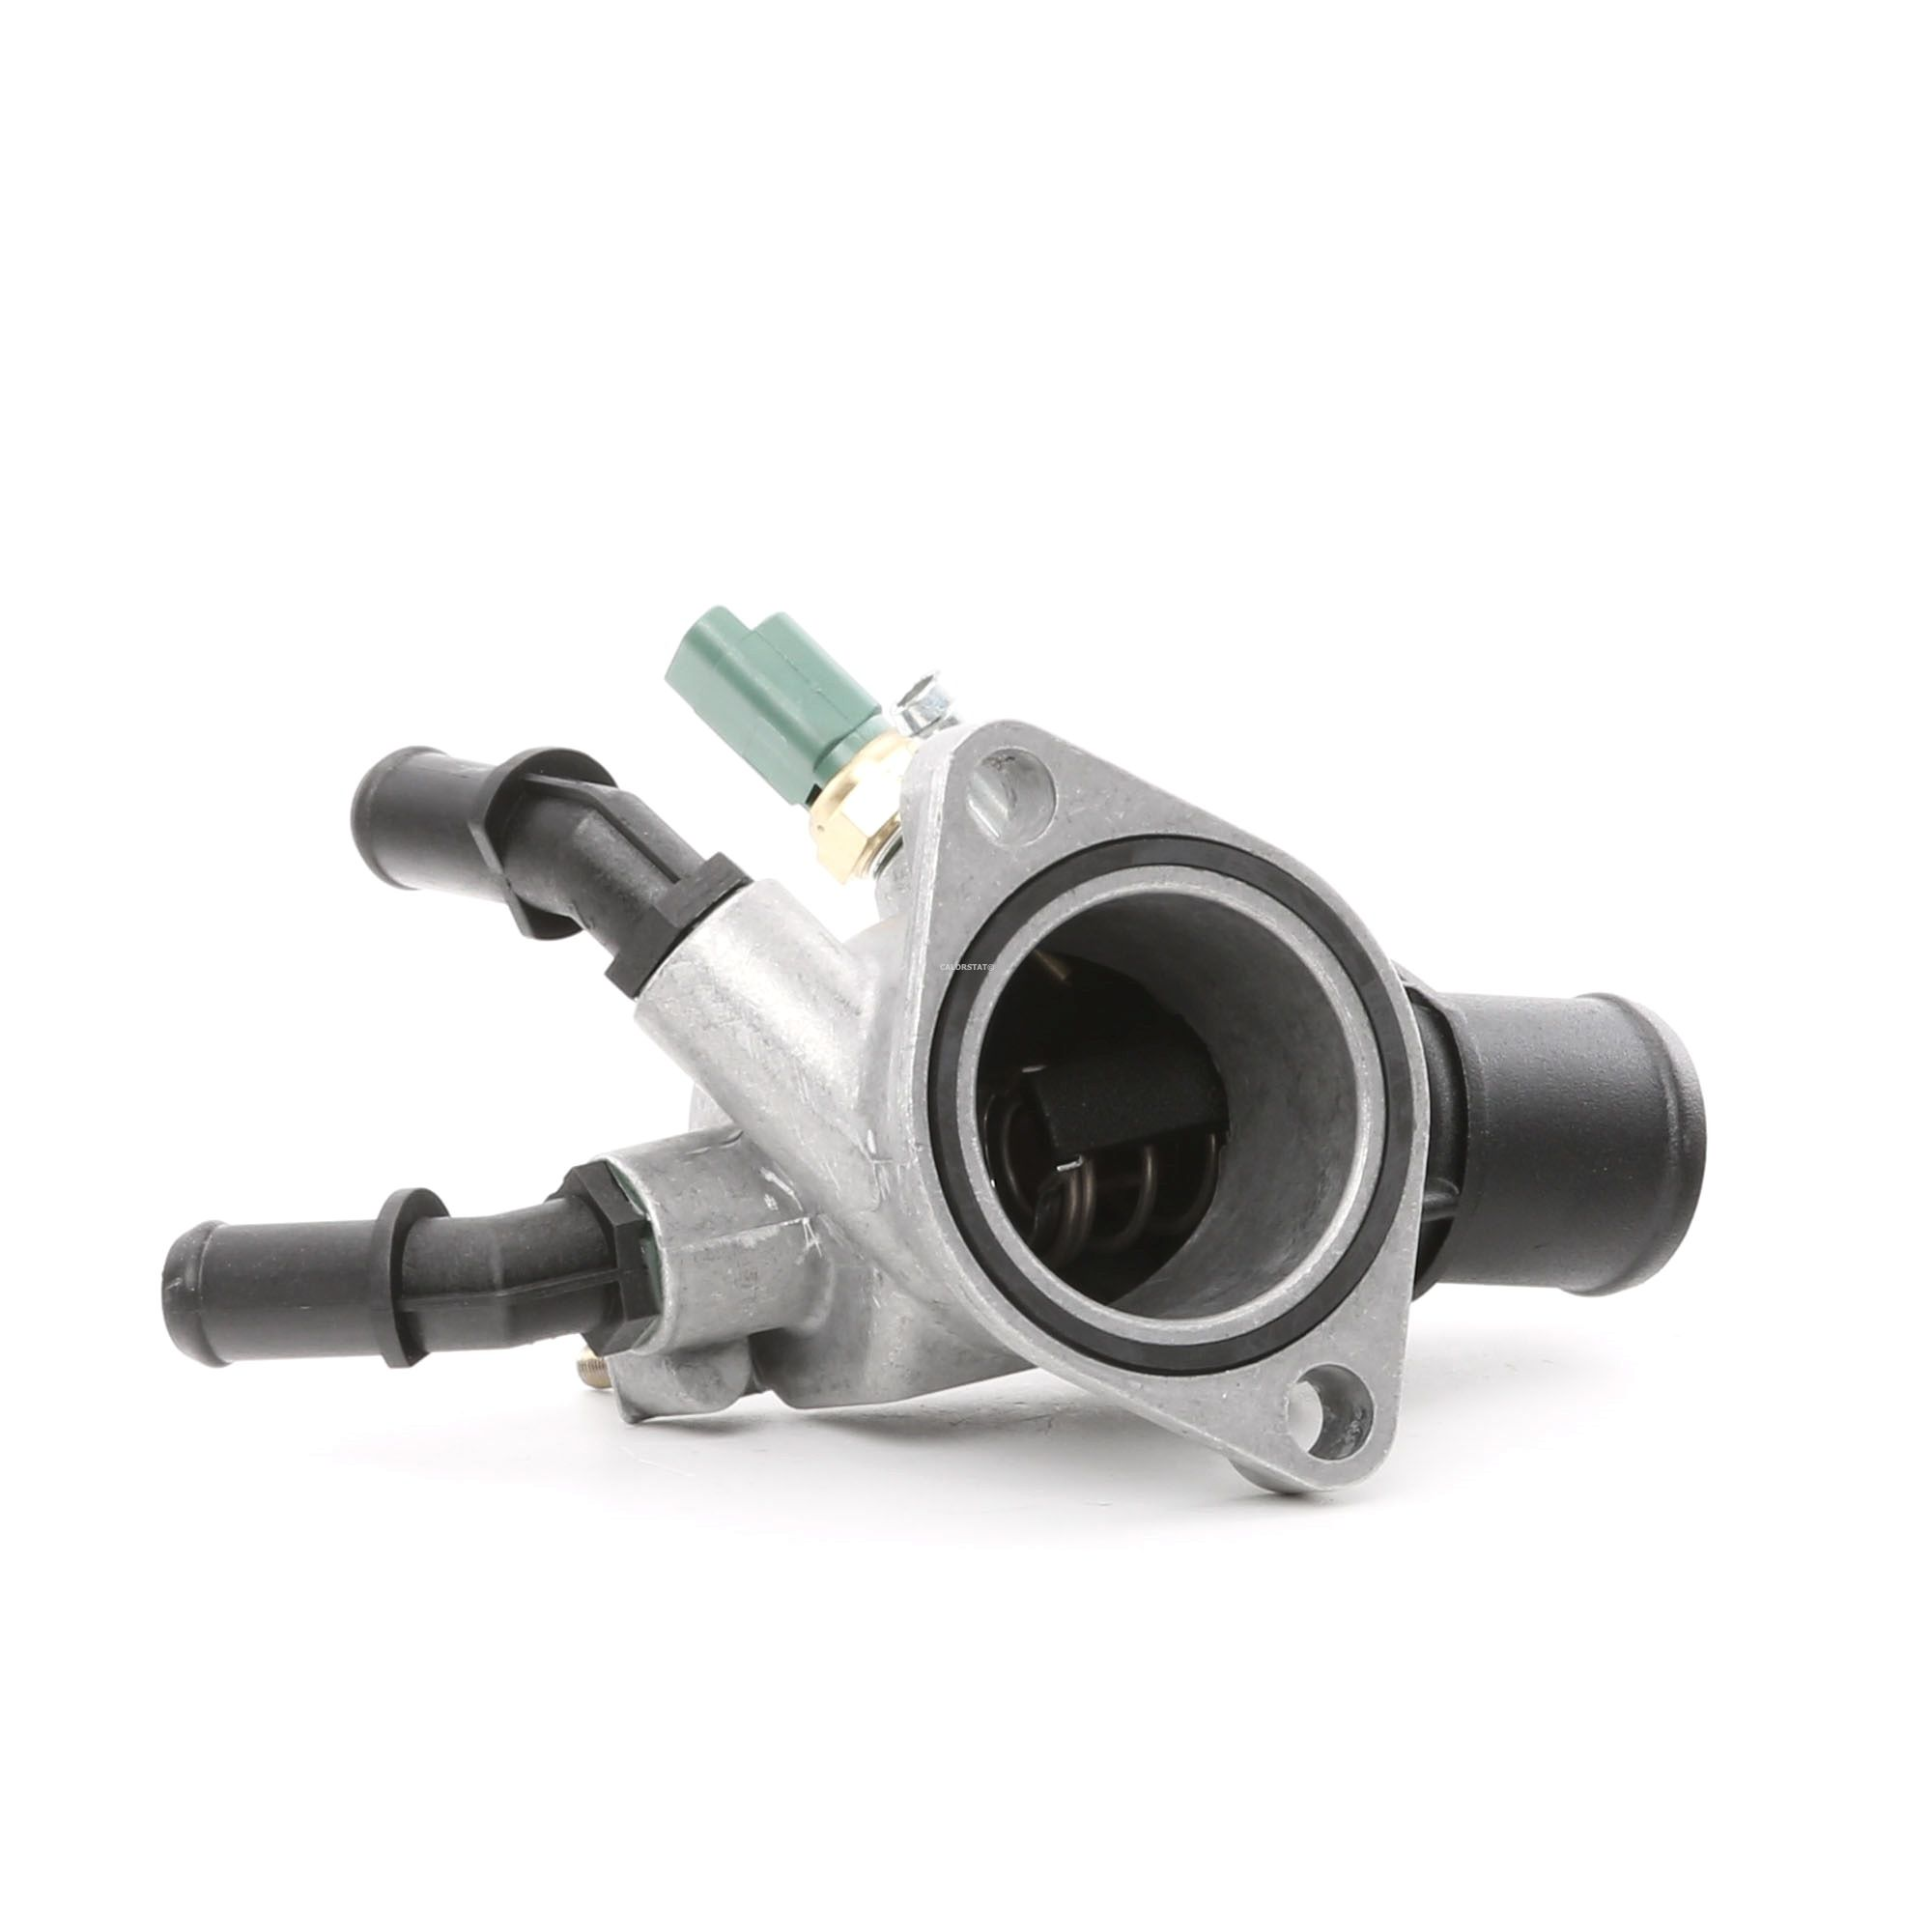 TH6978.88J CALORSTAT by Vernet Öffnungstemperatur: 88°C, mit Dichtung, mit Sensor, Metallgehäuse Thermostat, Kühlmittel TH6978.88J günstig kaufen